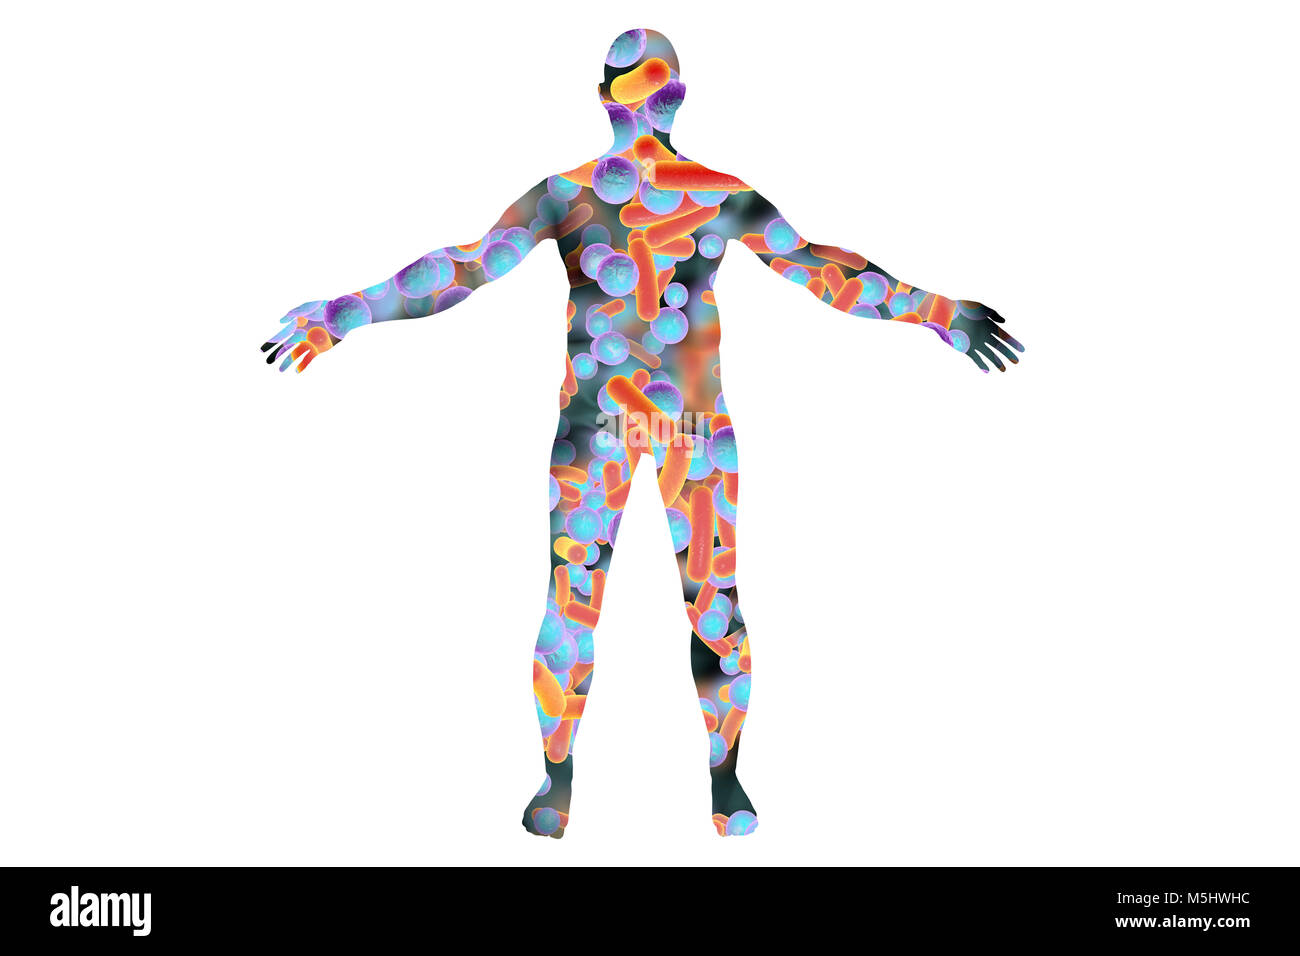 Human microbiome, conceptual illustration. Bacteria forming a human body. - Stock Image